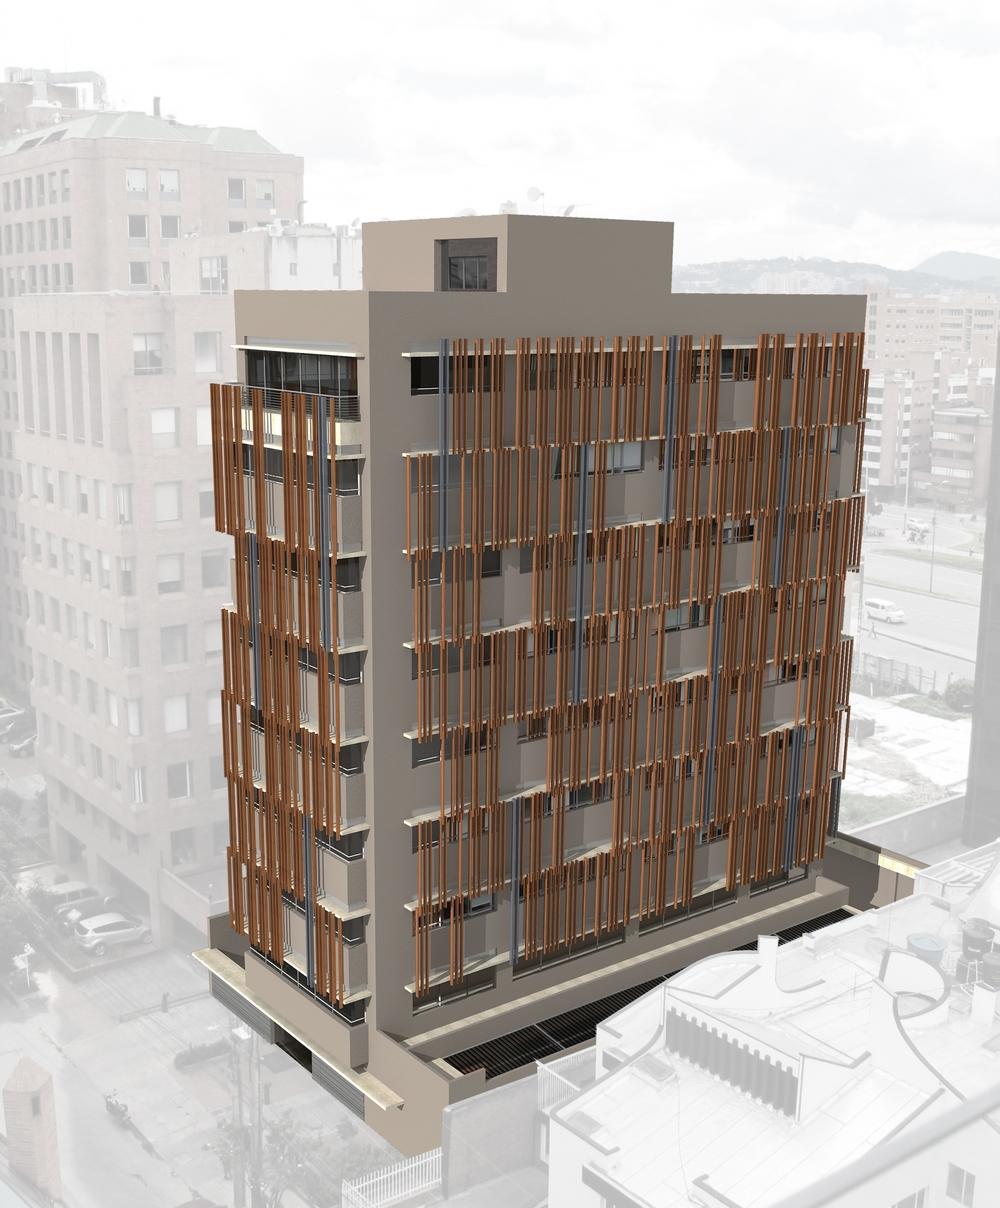 GLA-edificio ofiicinas-montaje fachada -final 3-25.6.jpg